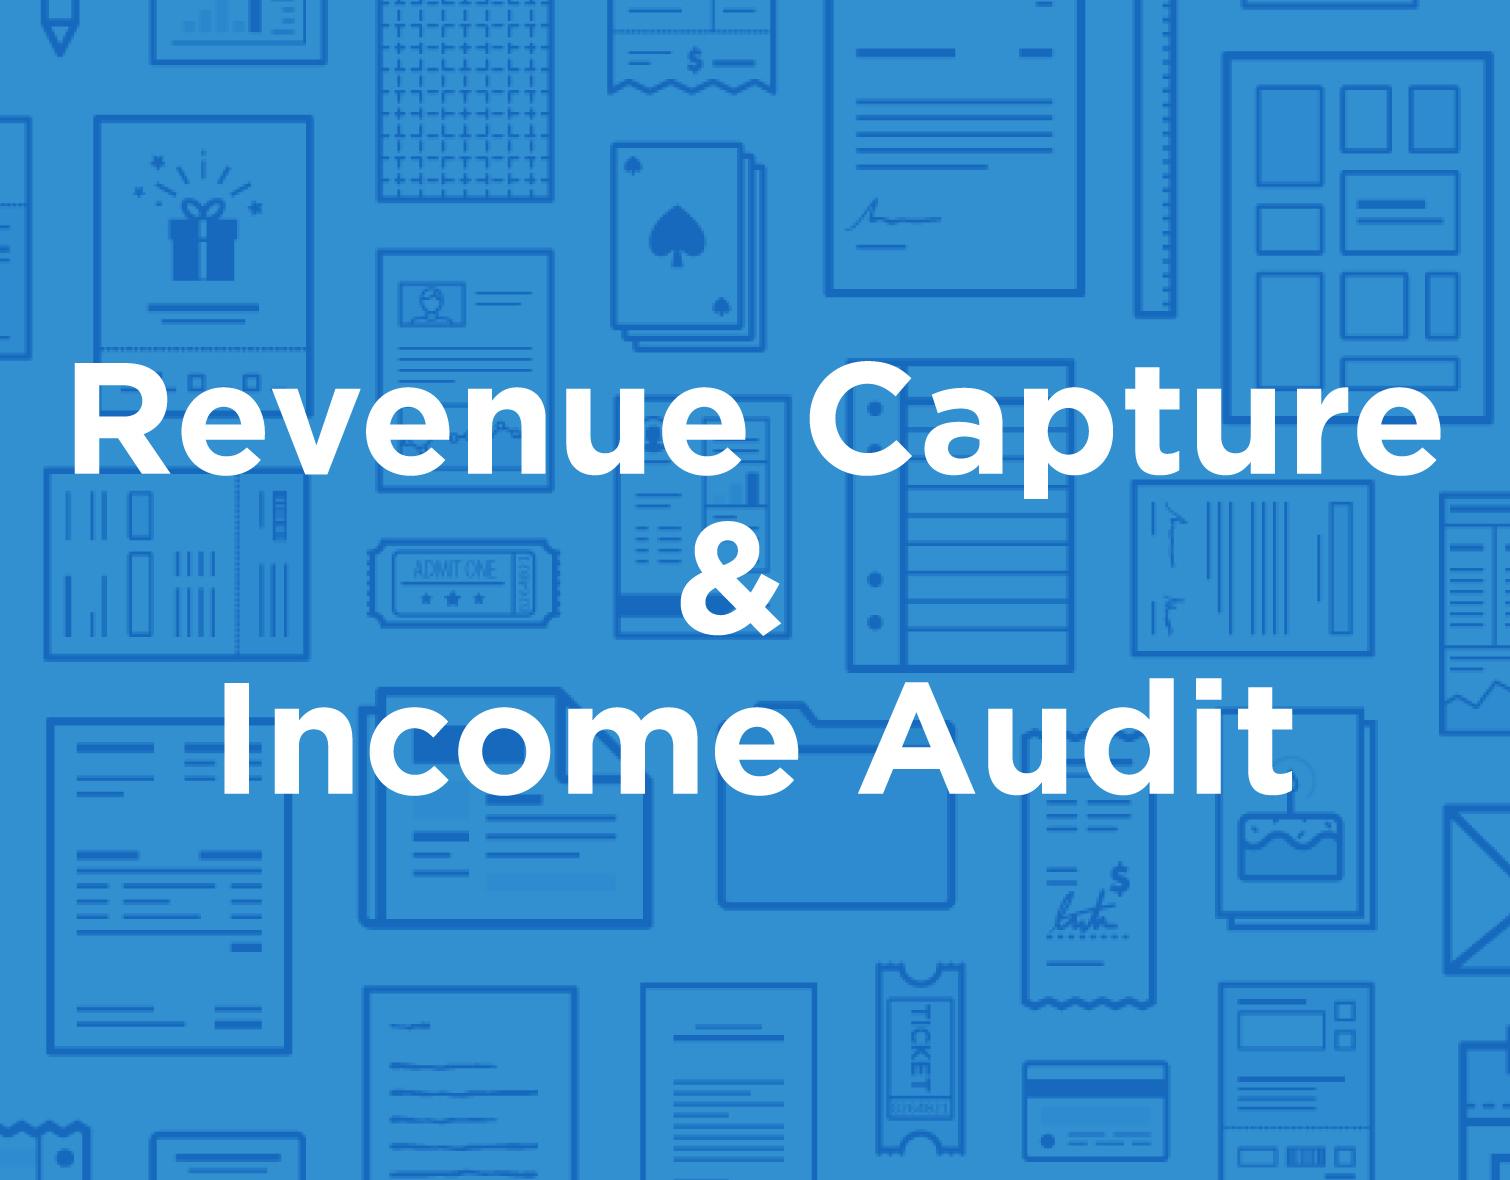 icon_Revenue-Capture_&_Income-Audit.jpg